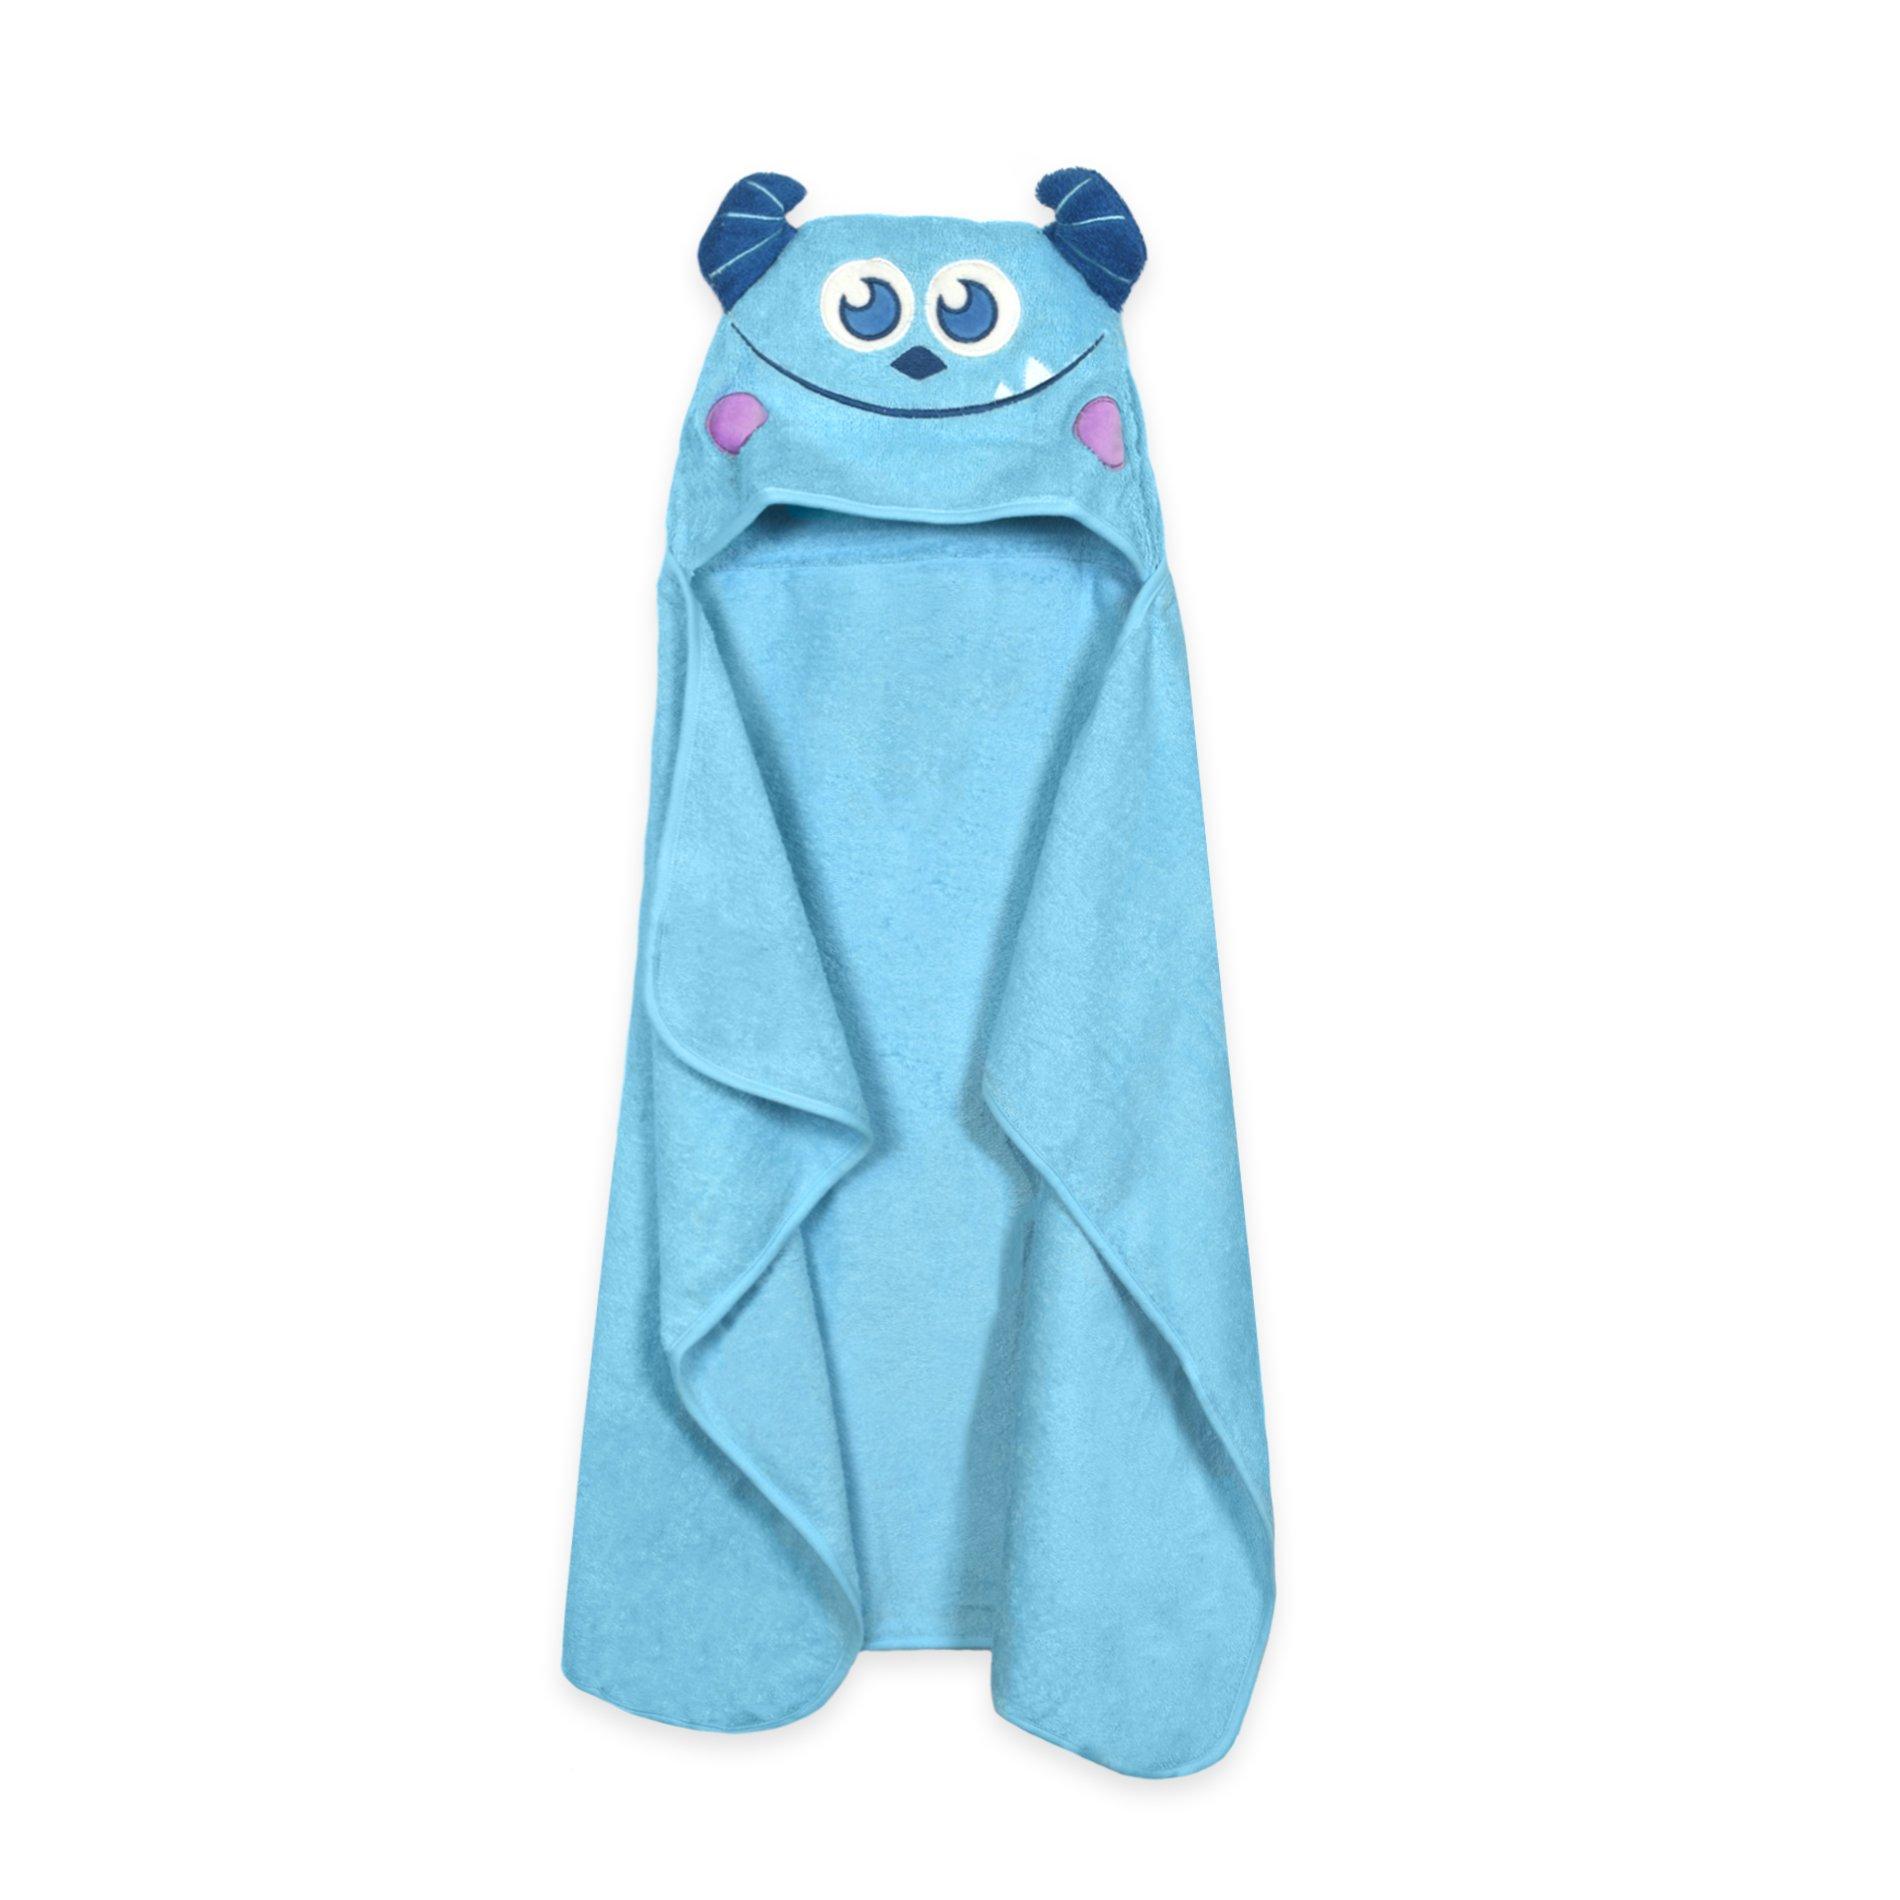 Amazon.com : Disney Baby Bath Swaddler, Pink Baby Princess : Baby ...